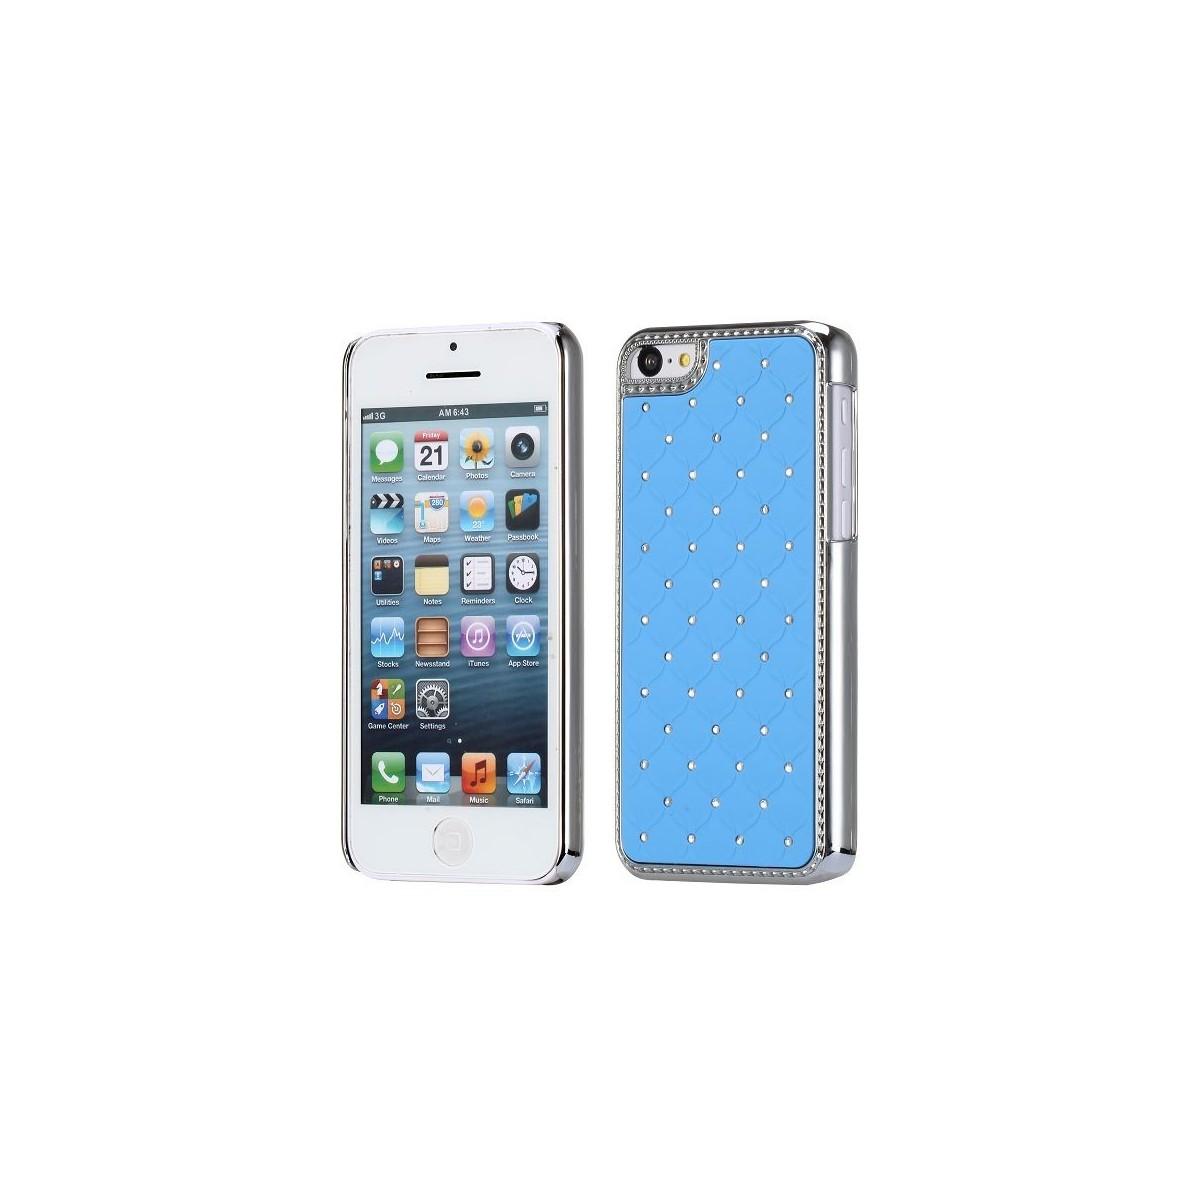 Crazy Kase - Coque iPhone 5C avec strass sur fond Bleu